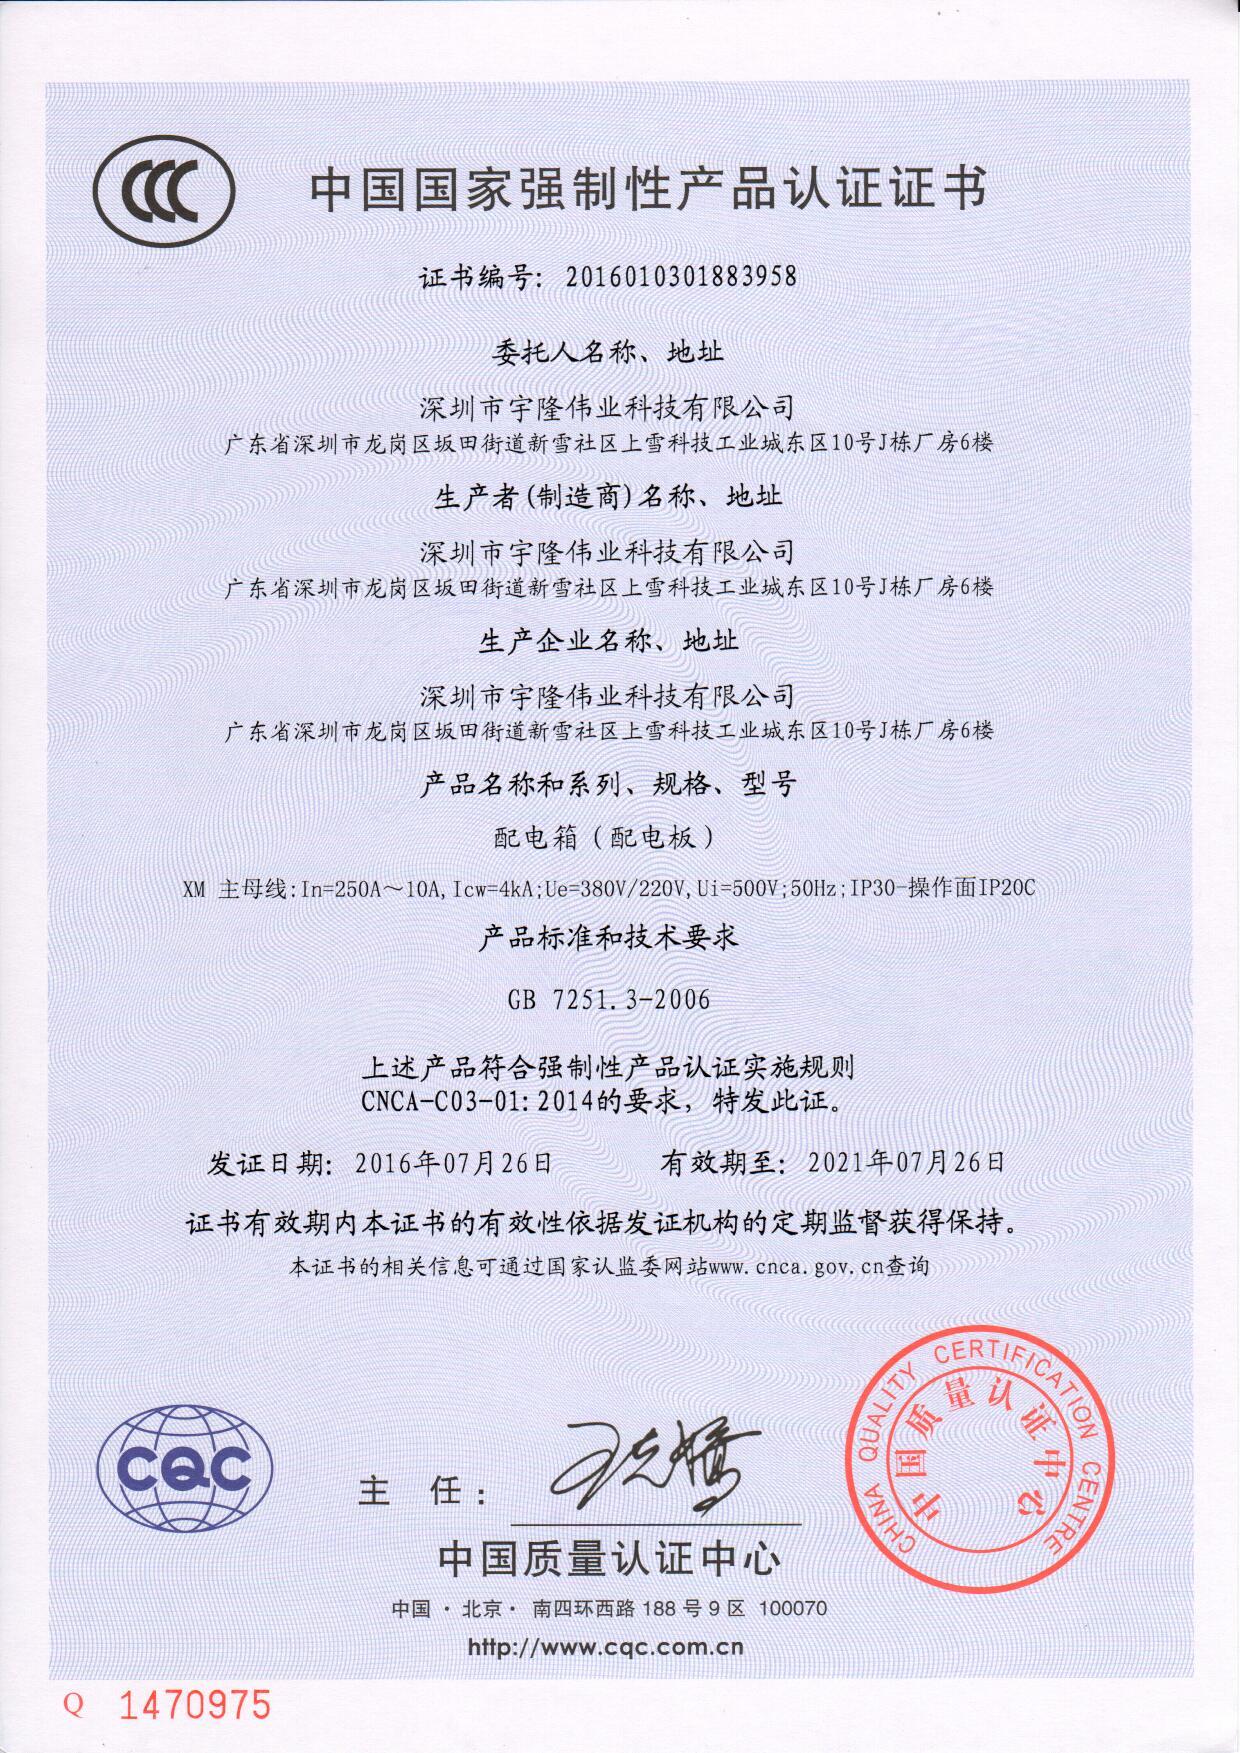 3C-XM证书